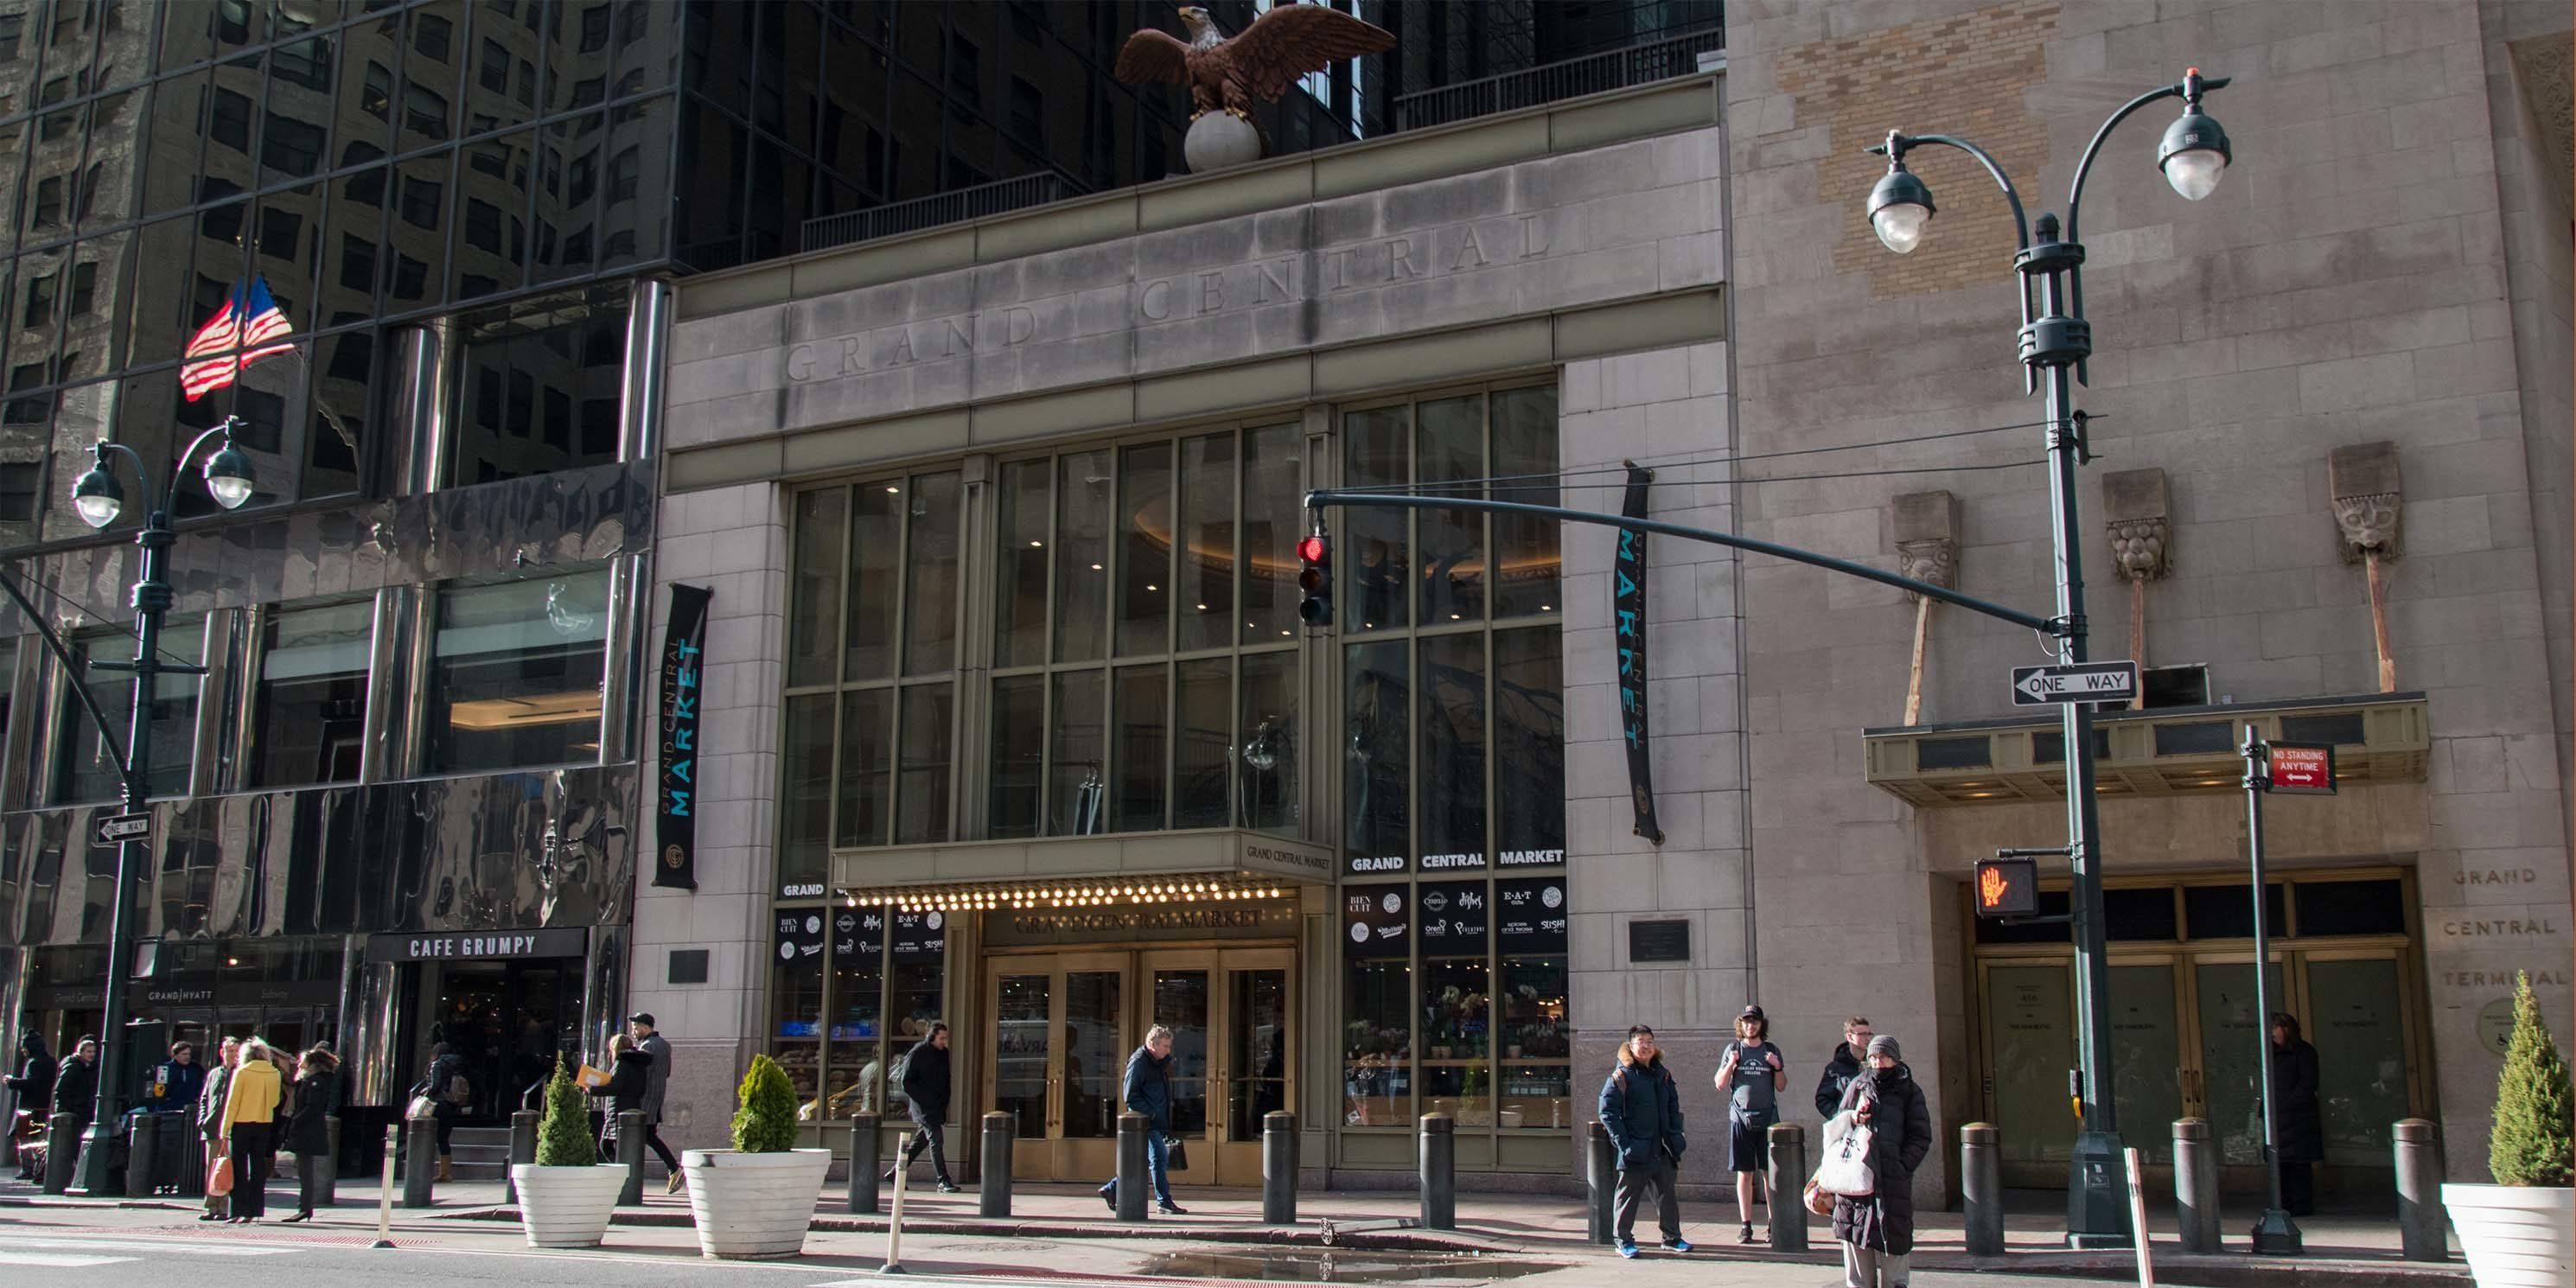 entrances to the Grand Central Market and Graybar Building on Lexington Avenue